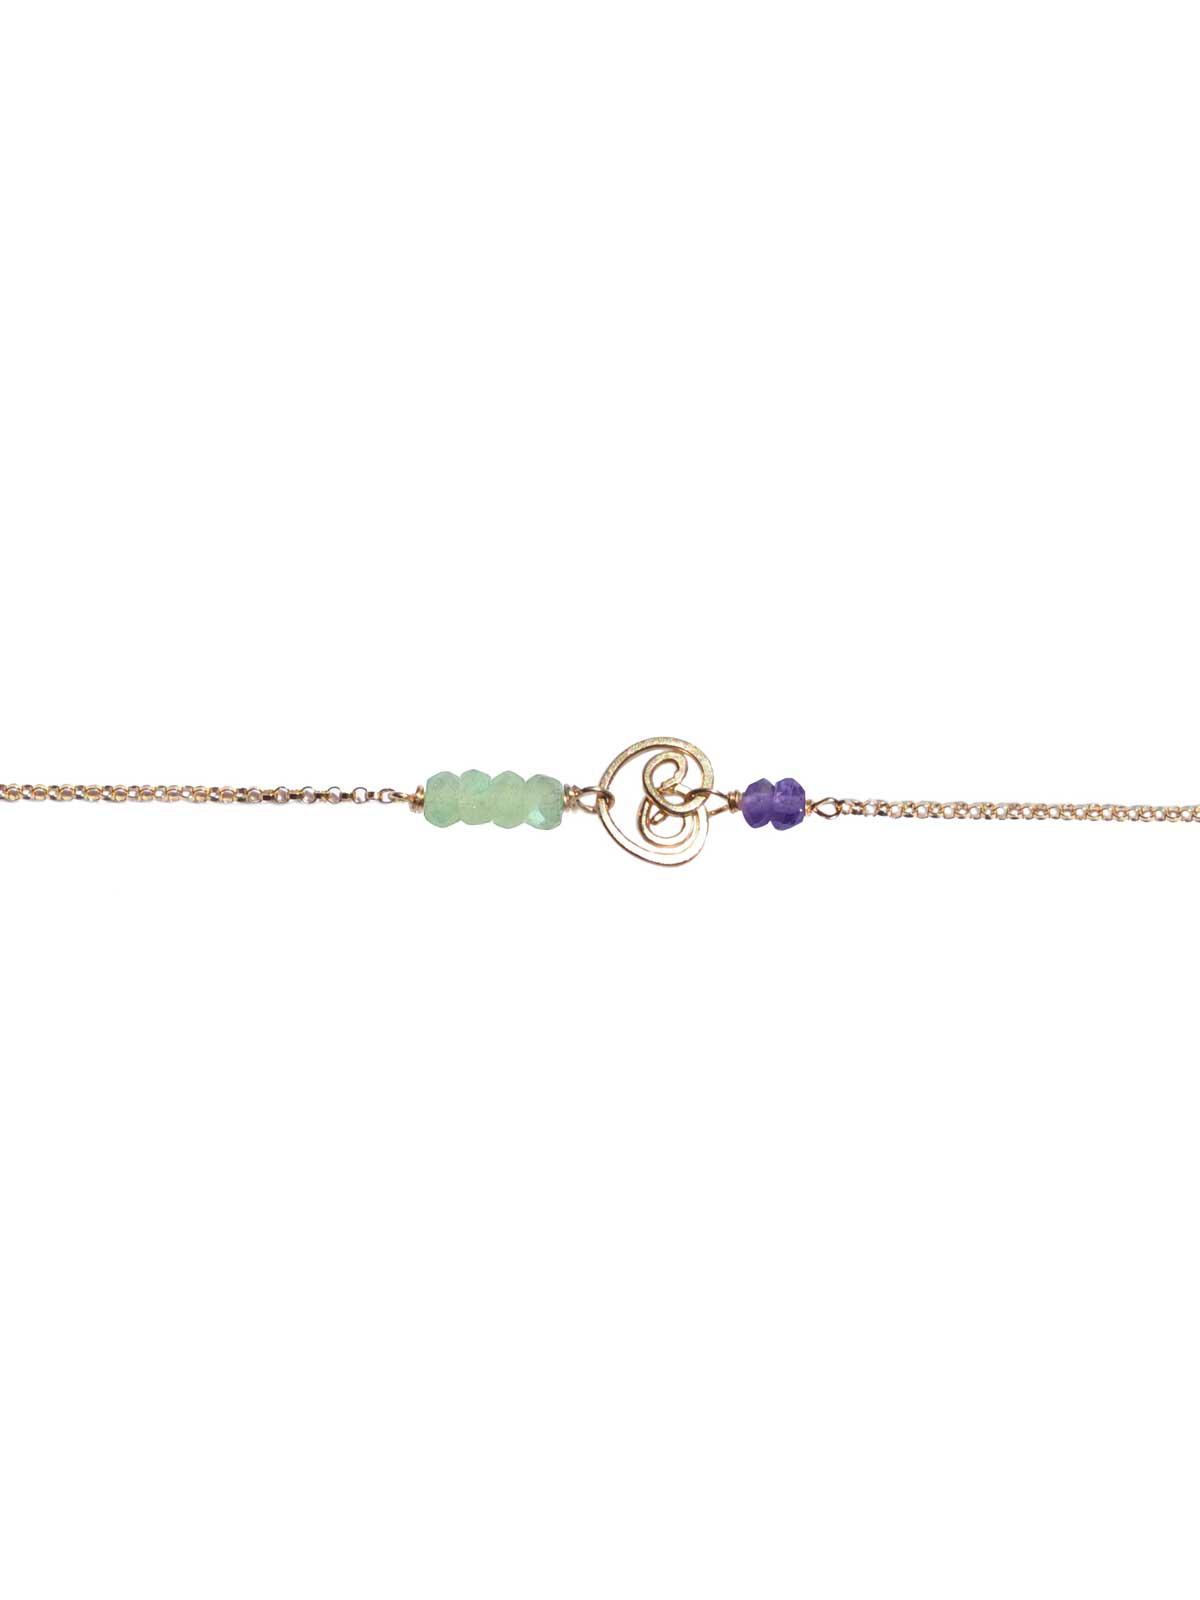 Bracelet Gold Prehnite Amethyst